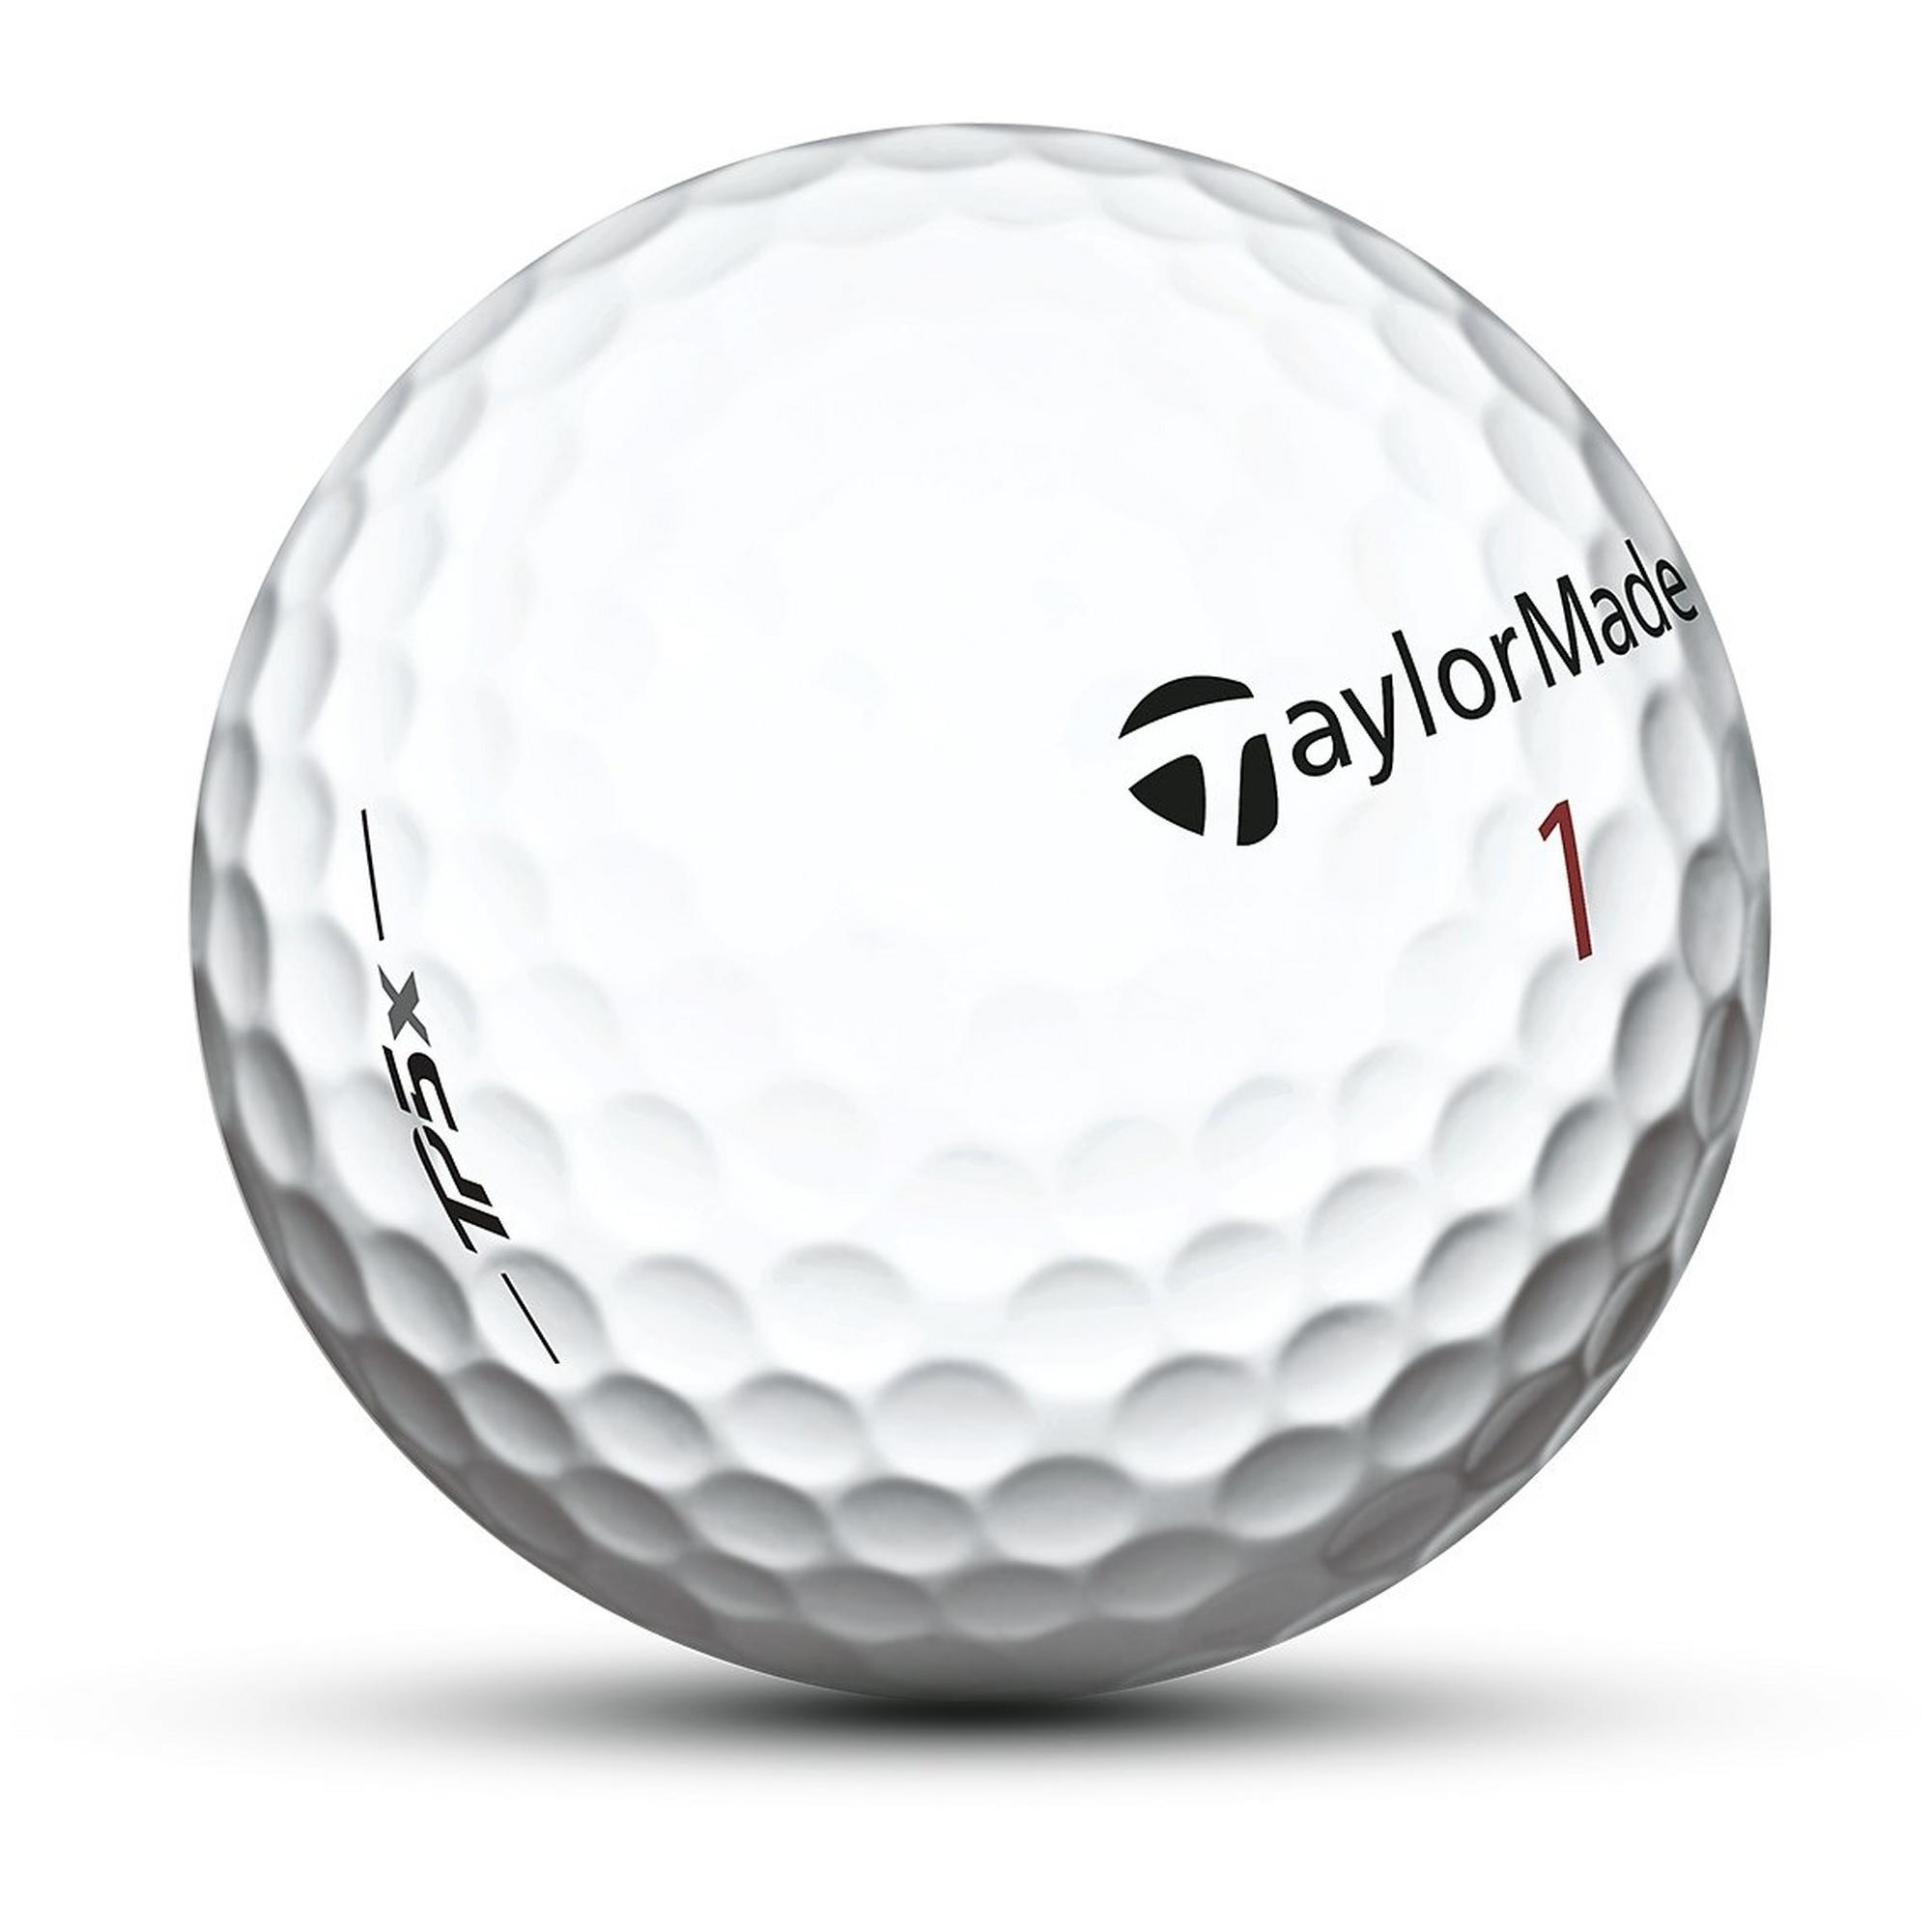 Prior Generation - TP5x Golf Balls